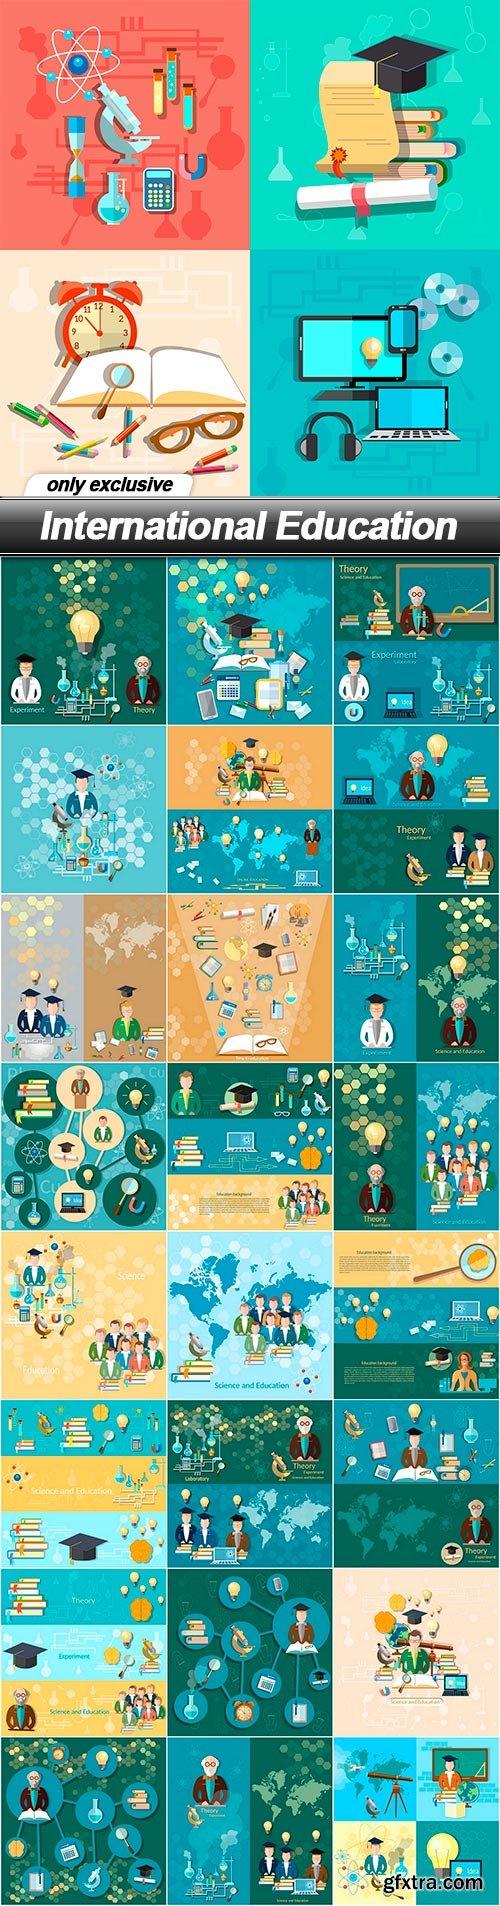 International Education - 25 EPS